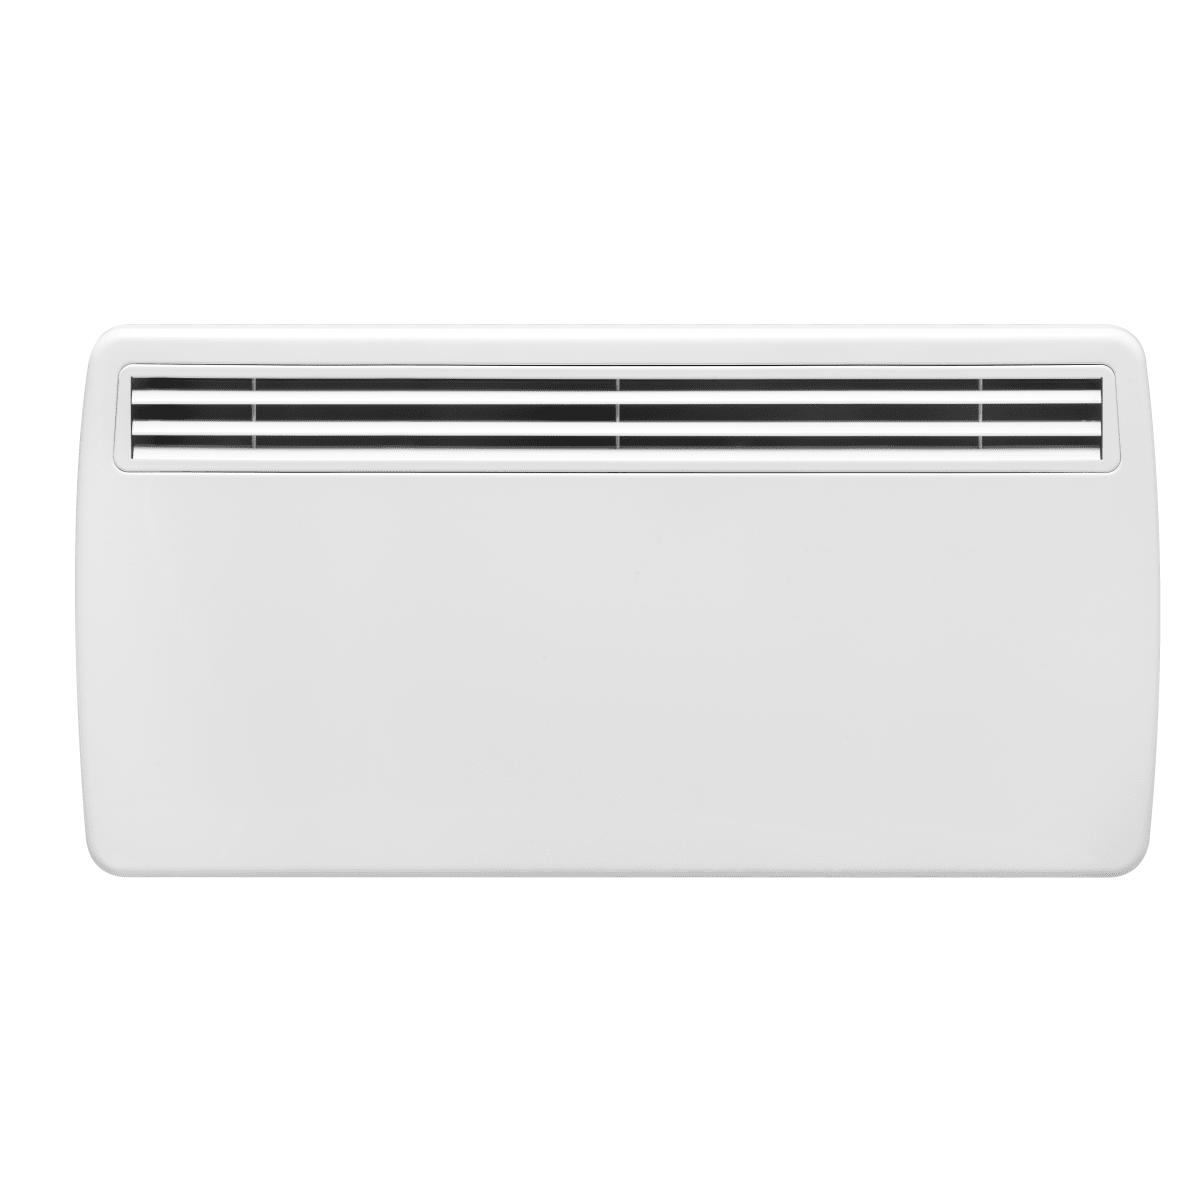 Dimplex Ppc2000 Build Com Wall Mounted Heater Dimplex Heater